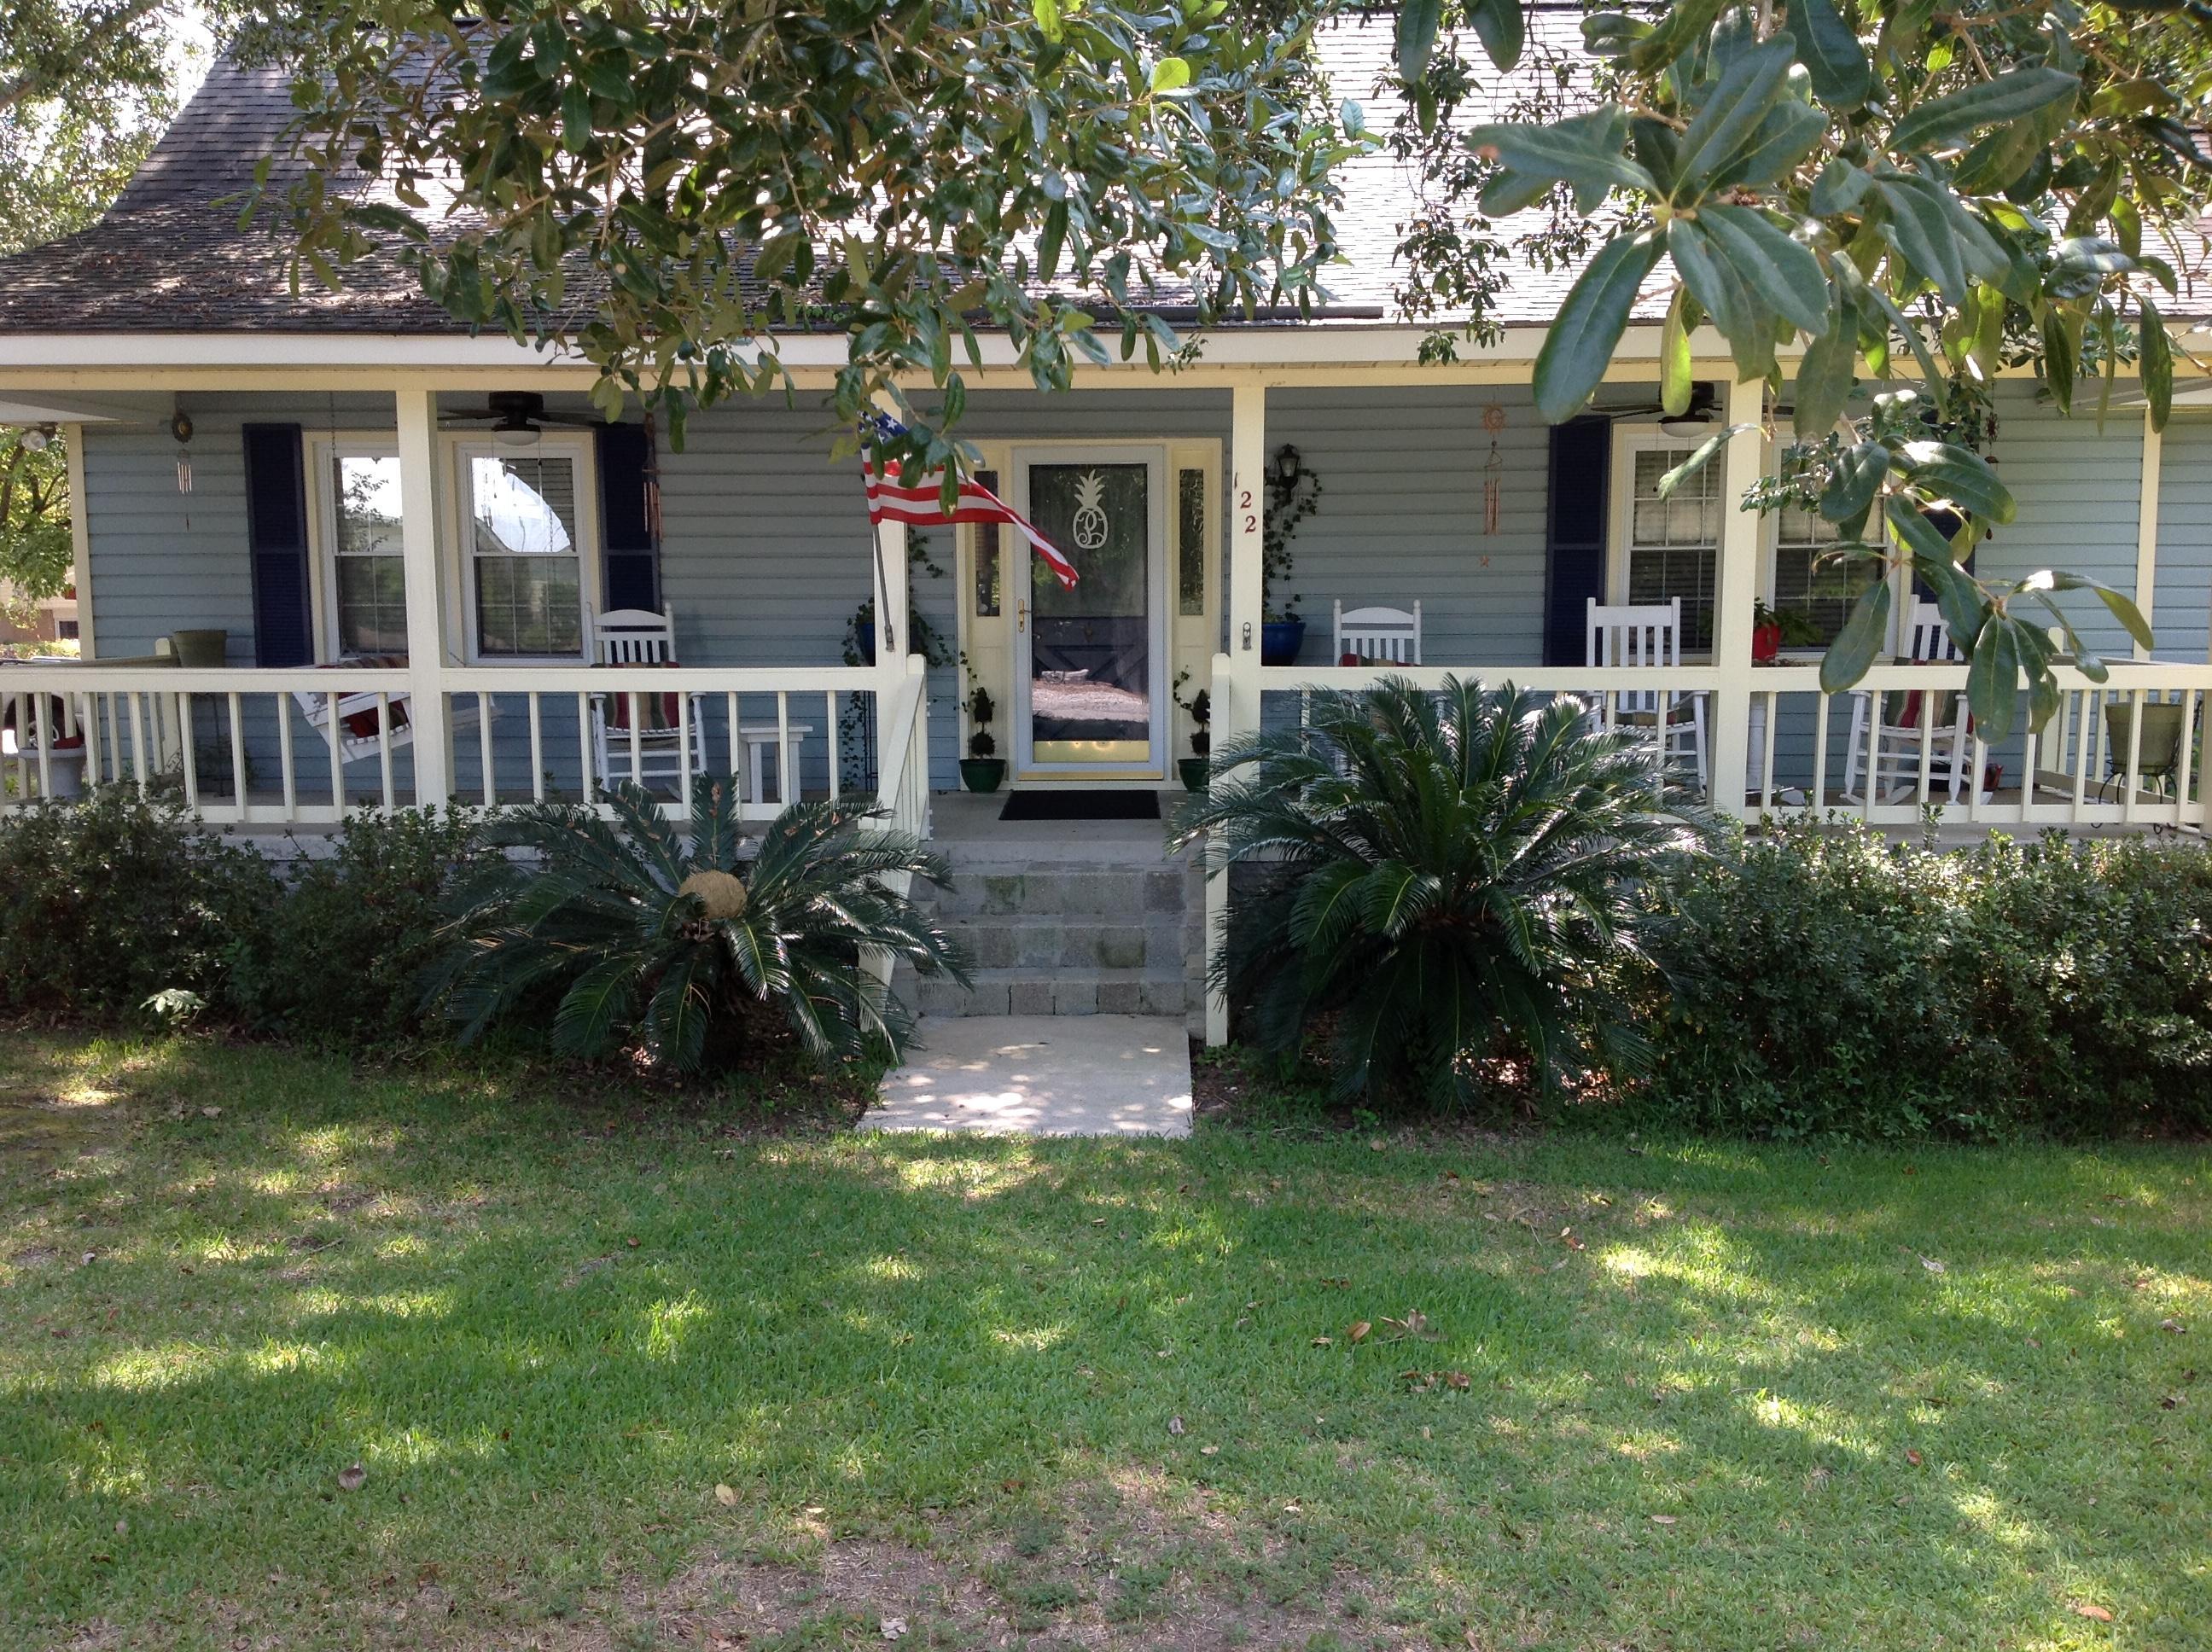 Belvedere II Homes For Sale - 122 Dogwood, Eutawville, SC - 17